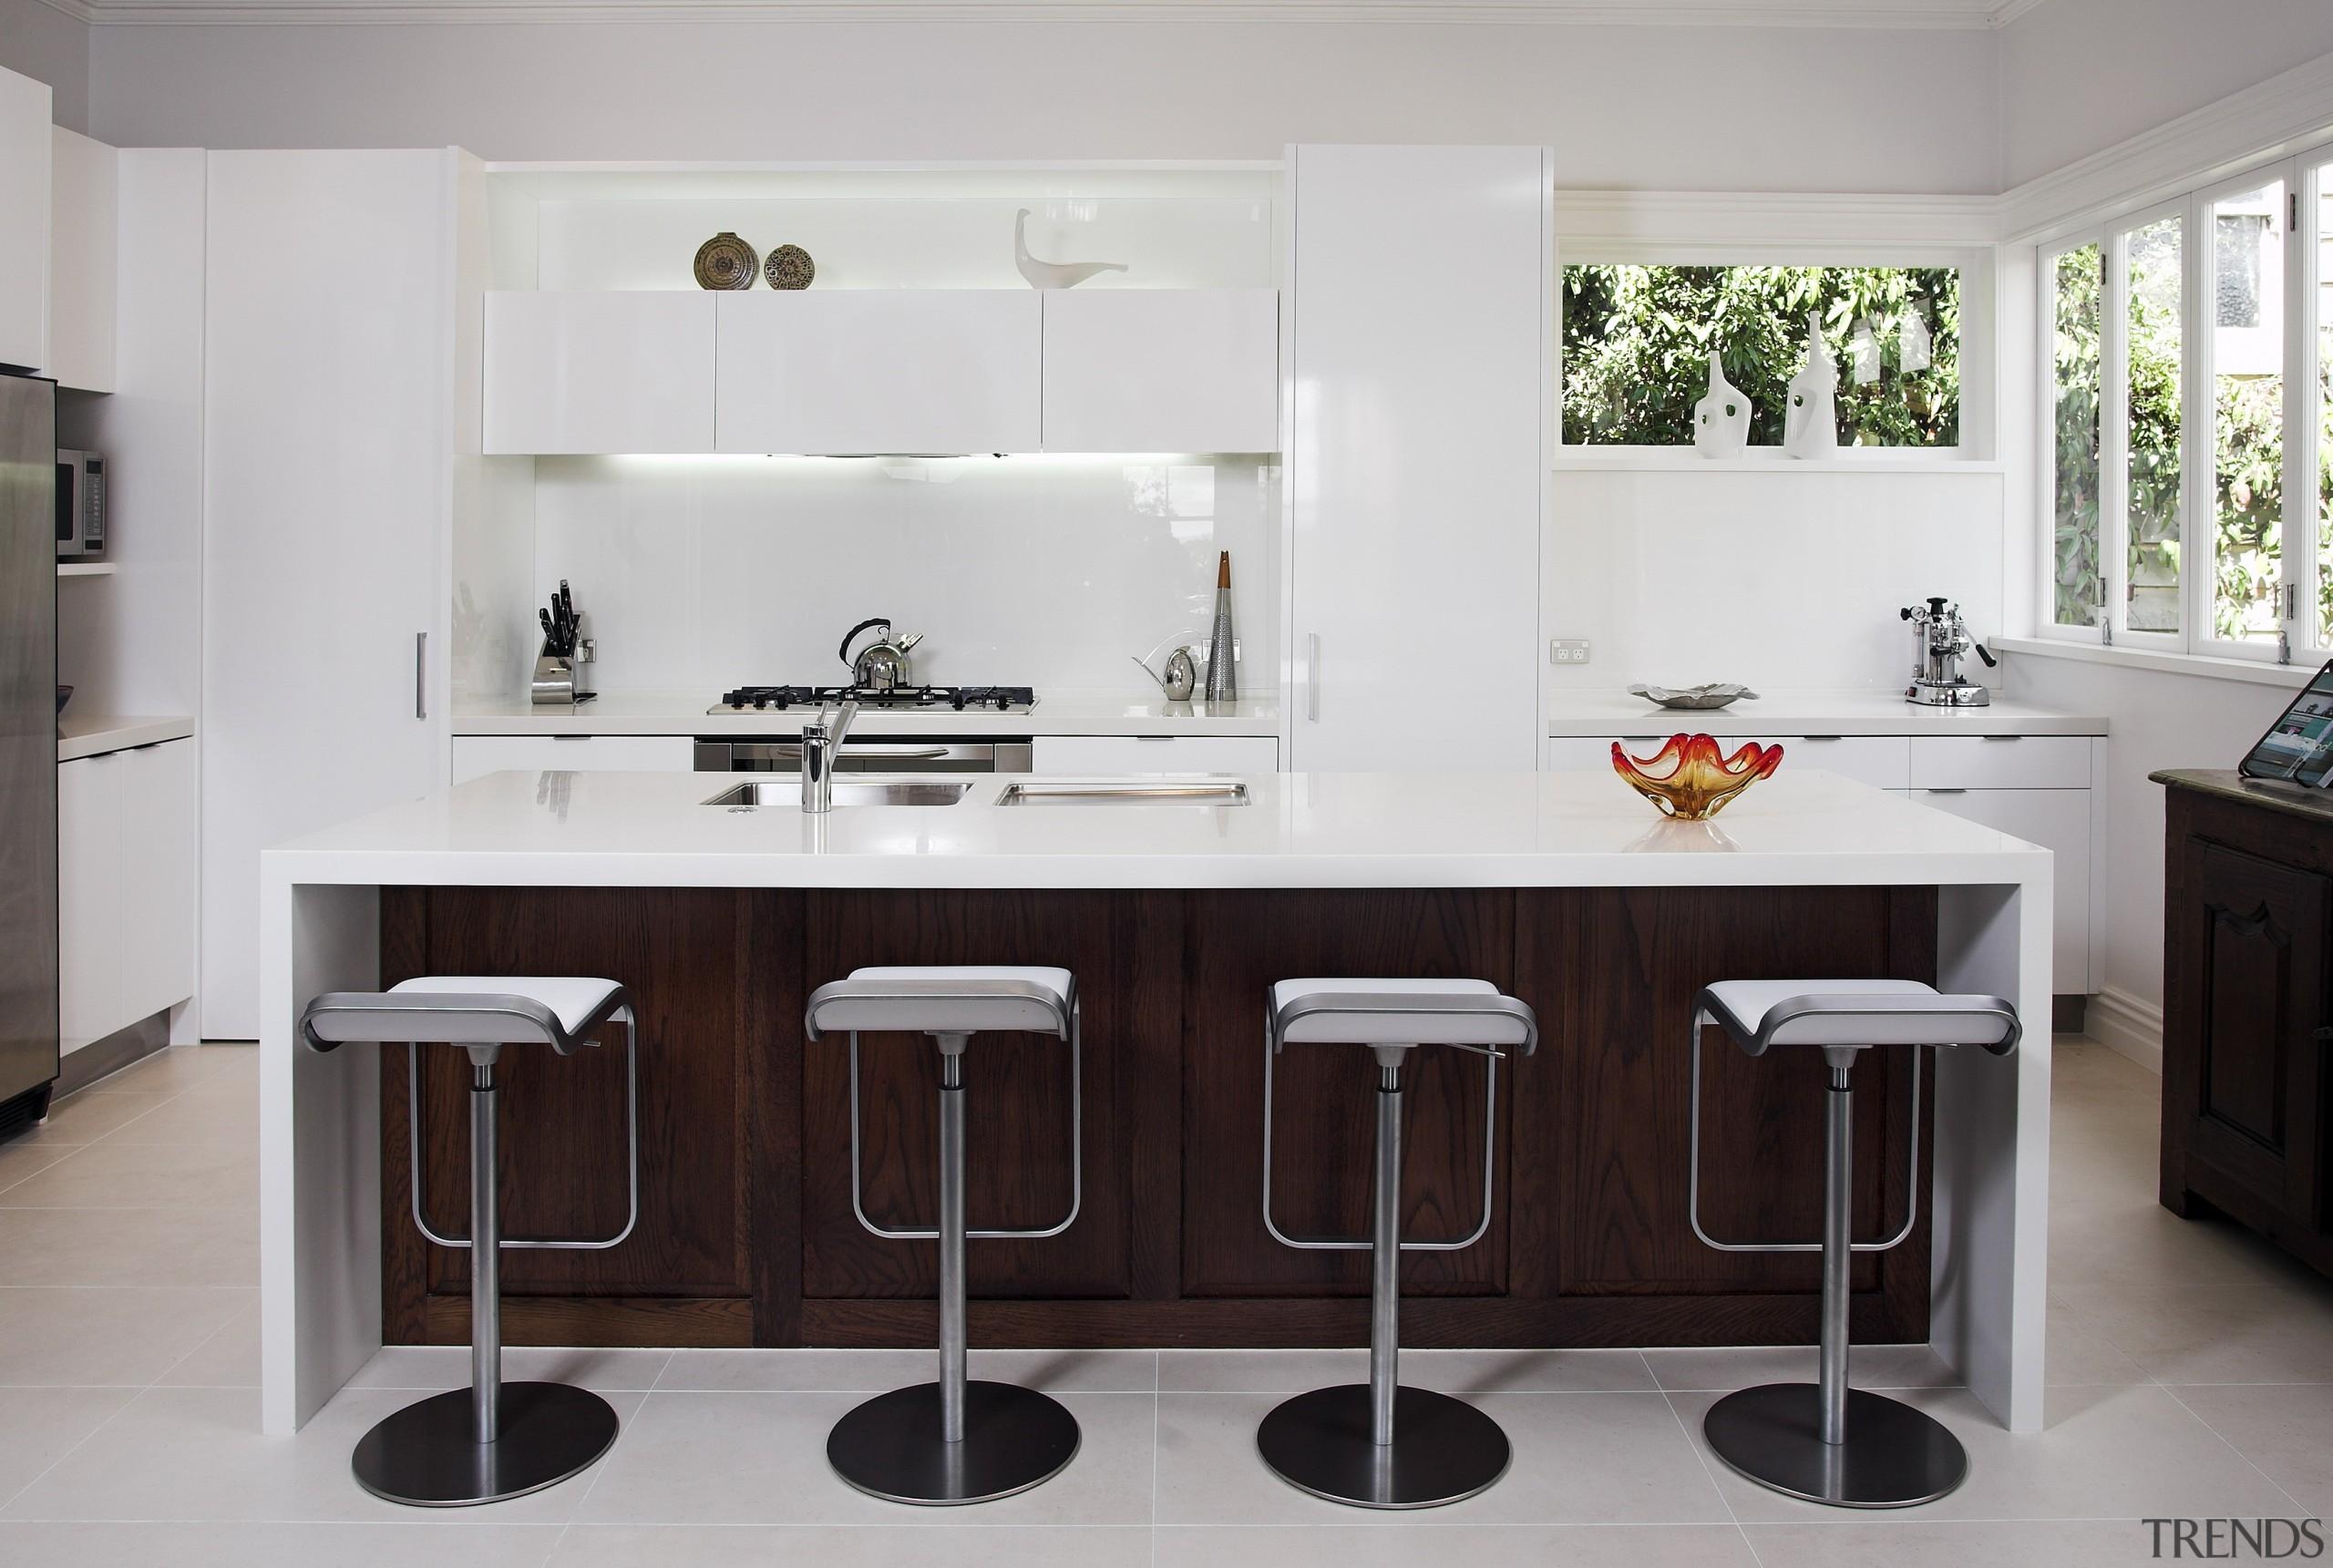 Ponsonby - cabinetry | countertop | cuisine classique cabinetry, countertop, cuisine classique, furniture, interior design, kitchen, room, gray